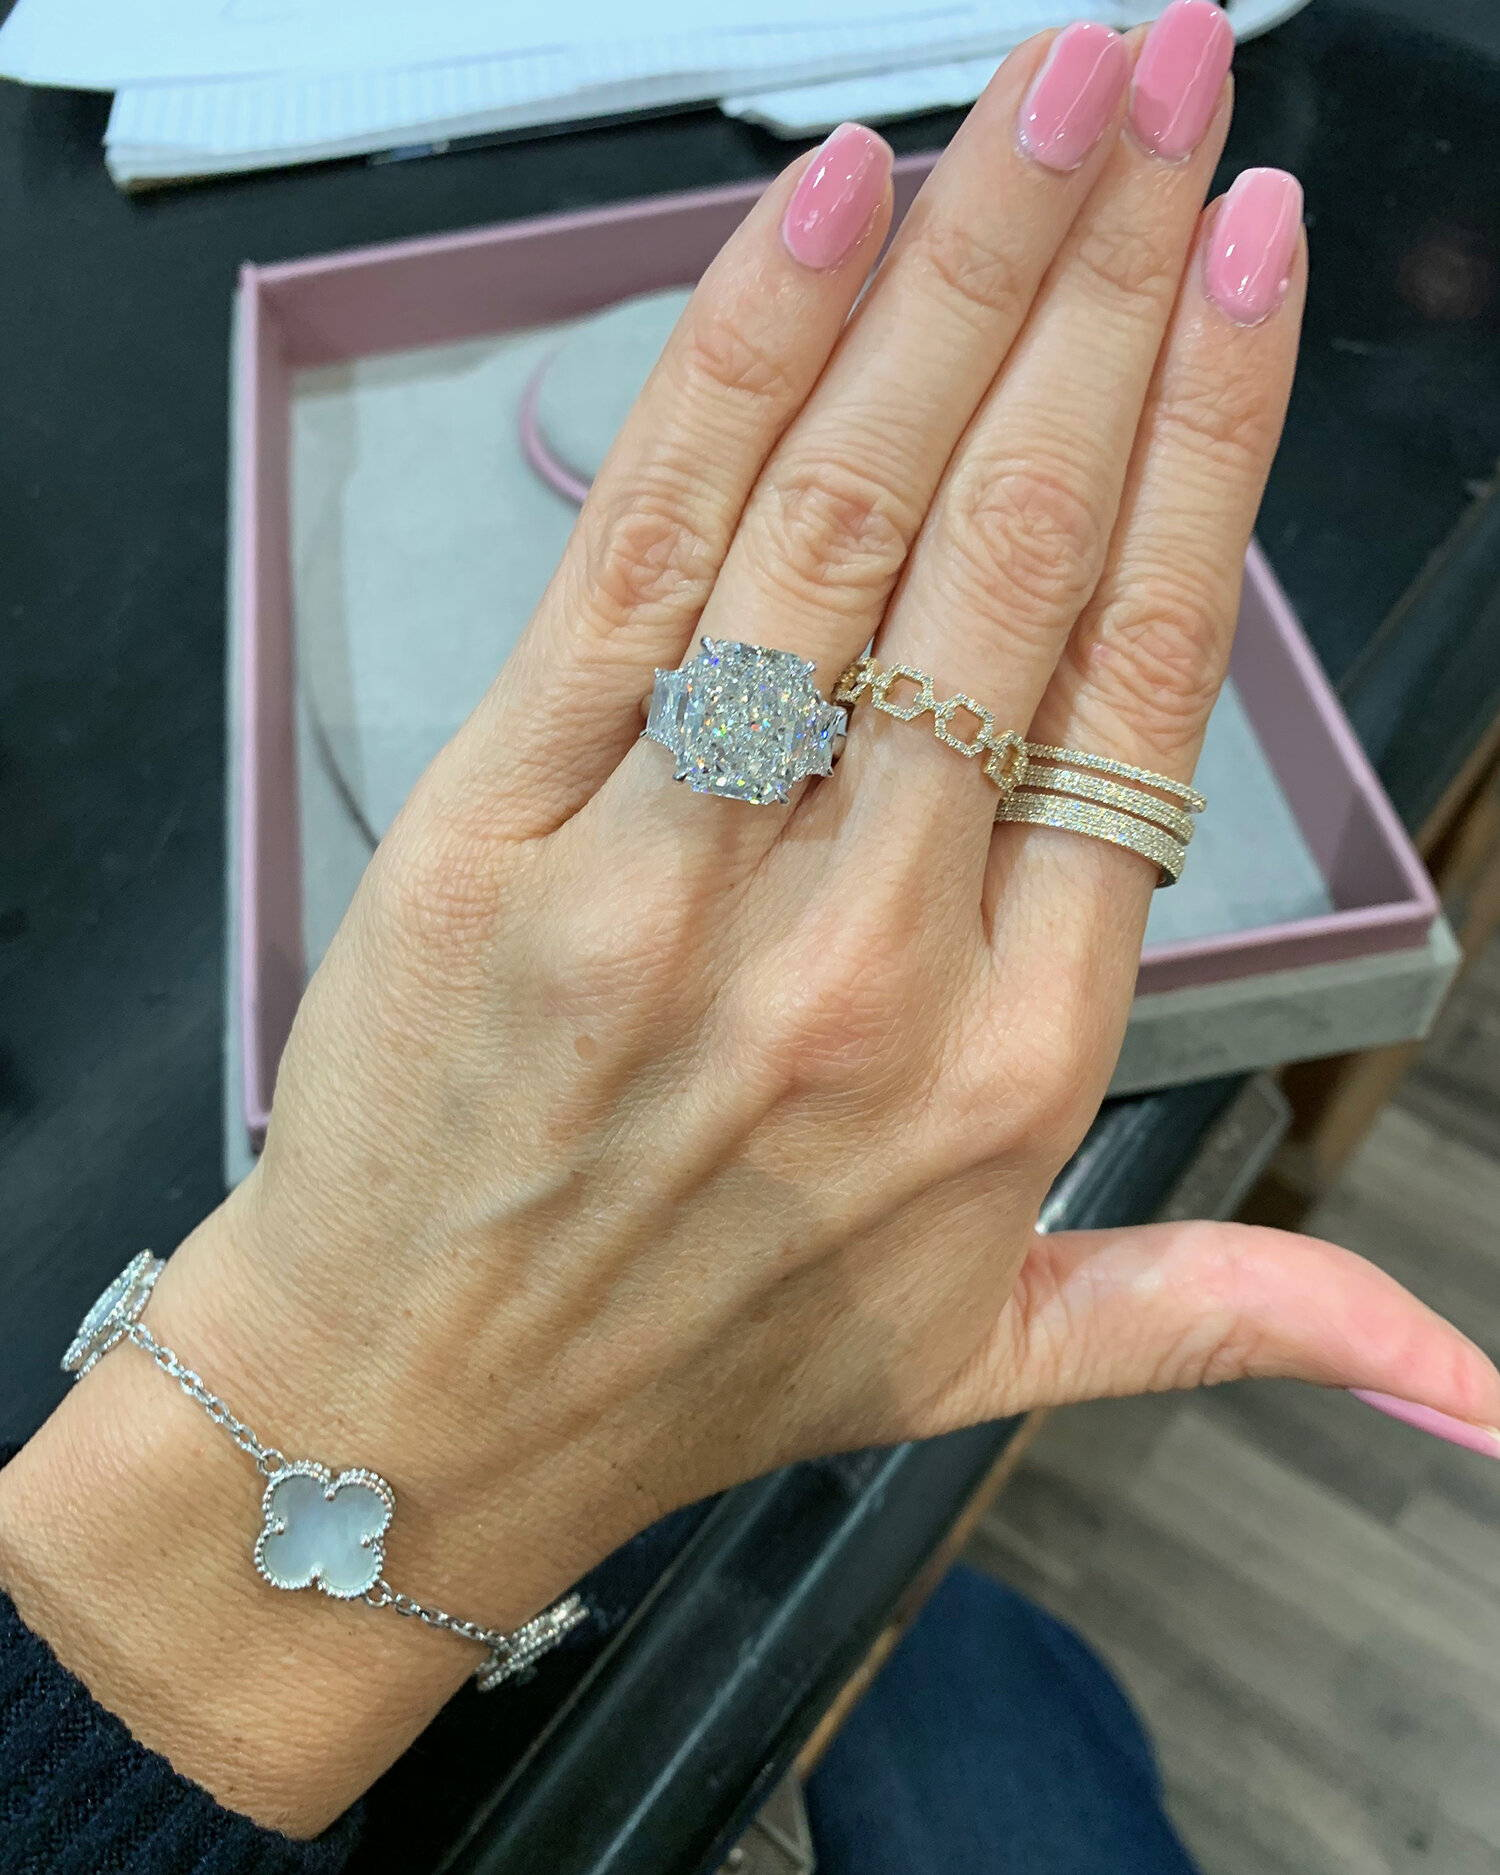 Miss Diamond Ring 7 Carat 8 Carat Cushion Diamond Engagement Ring